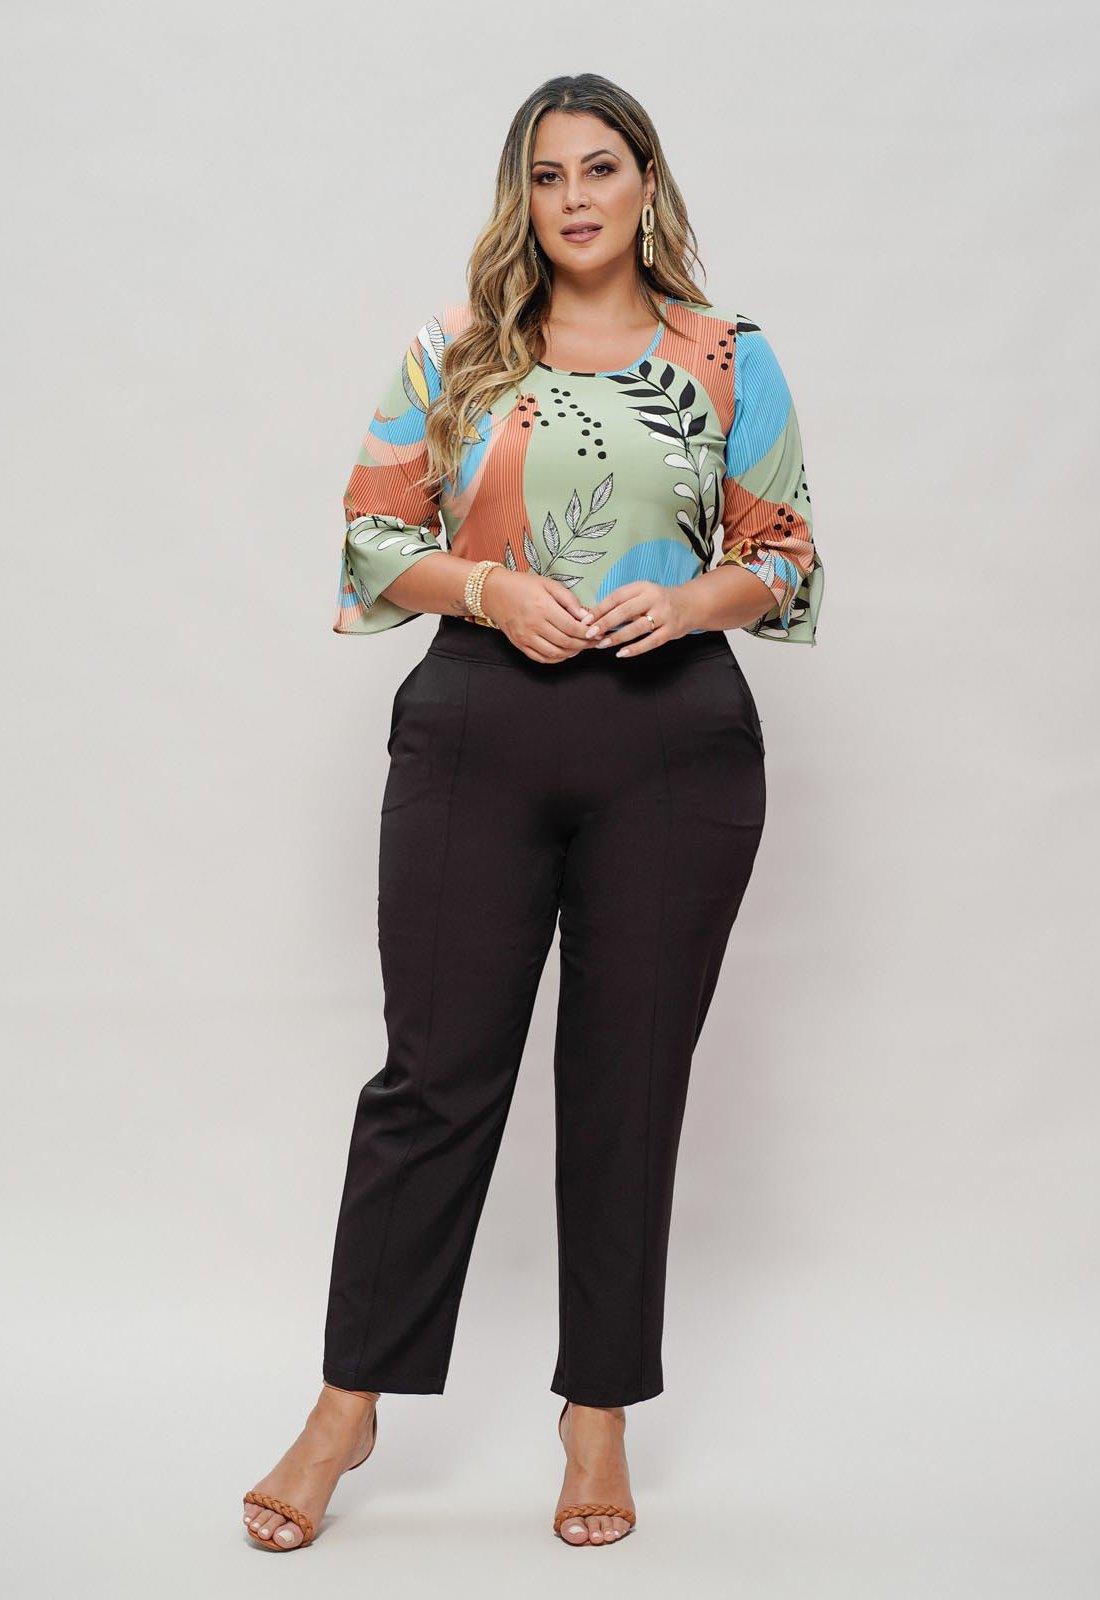 Blusa verde plus size estampada com manga Ref. U62521